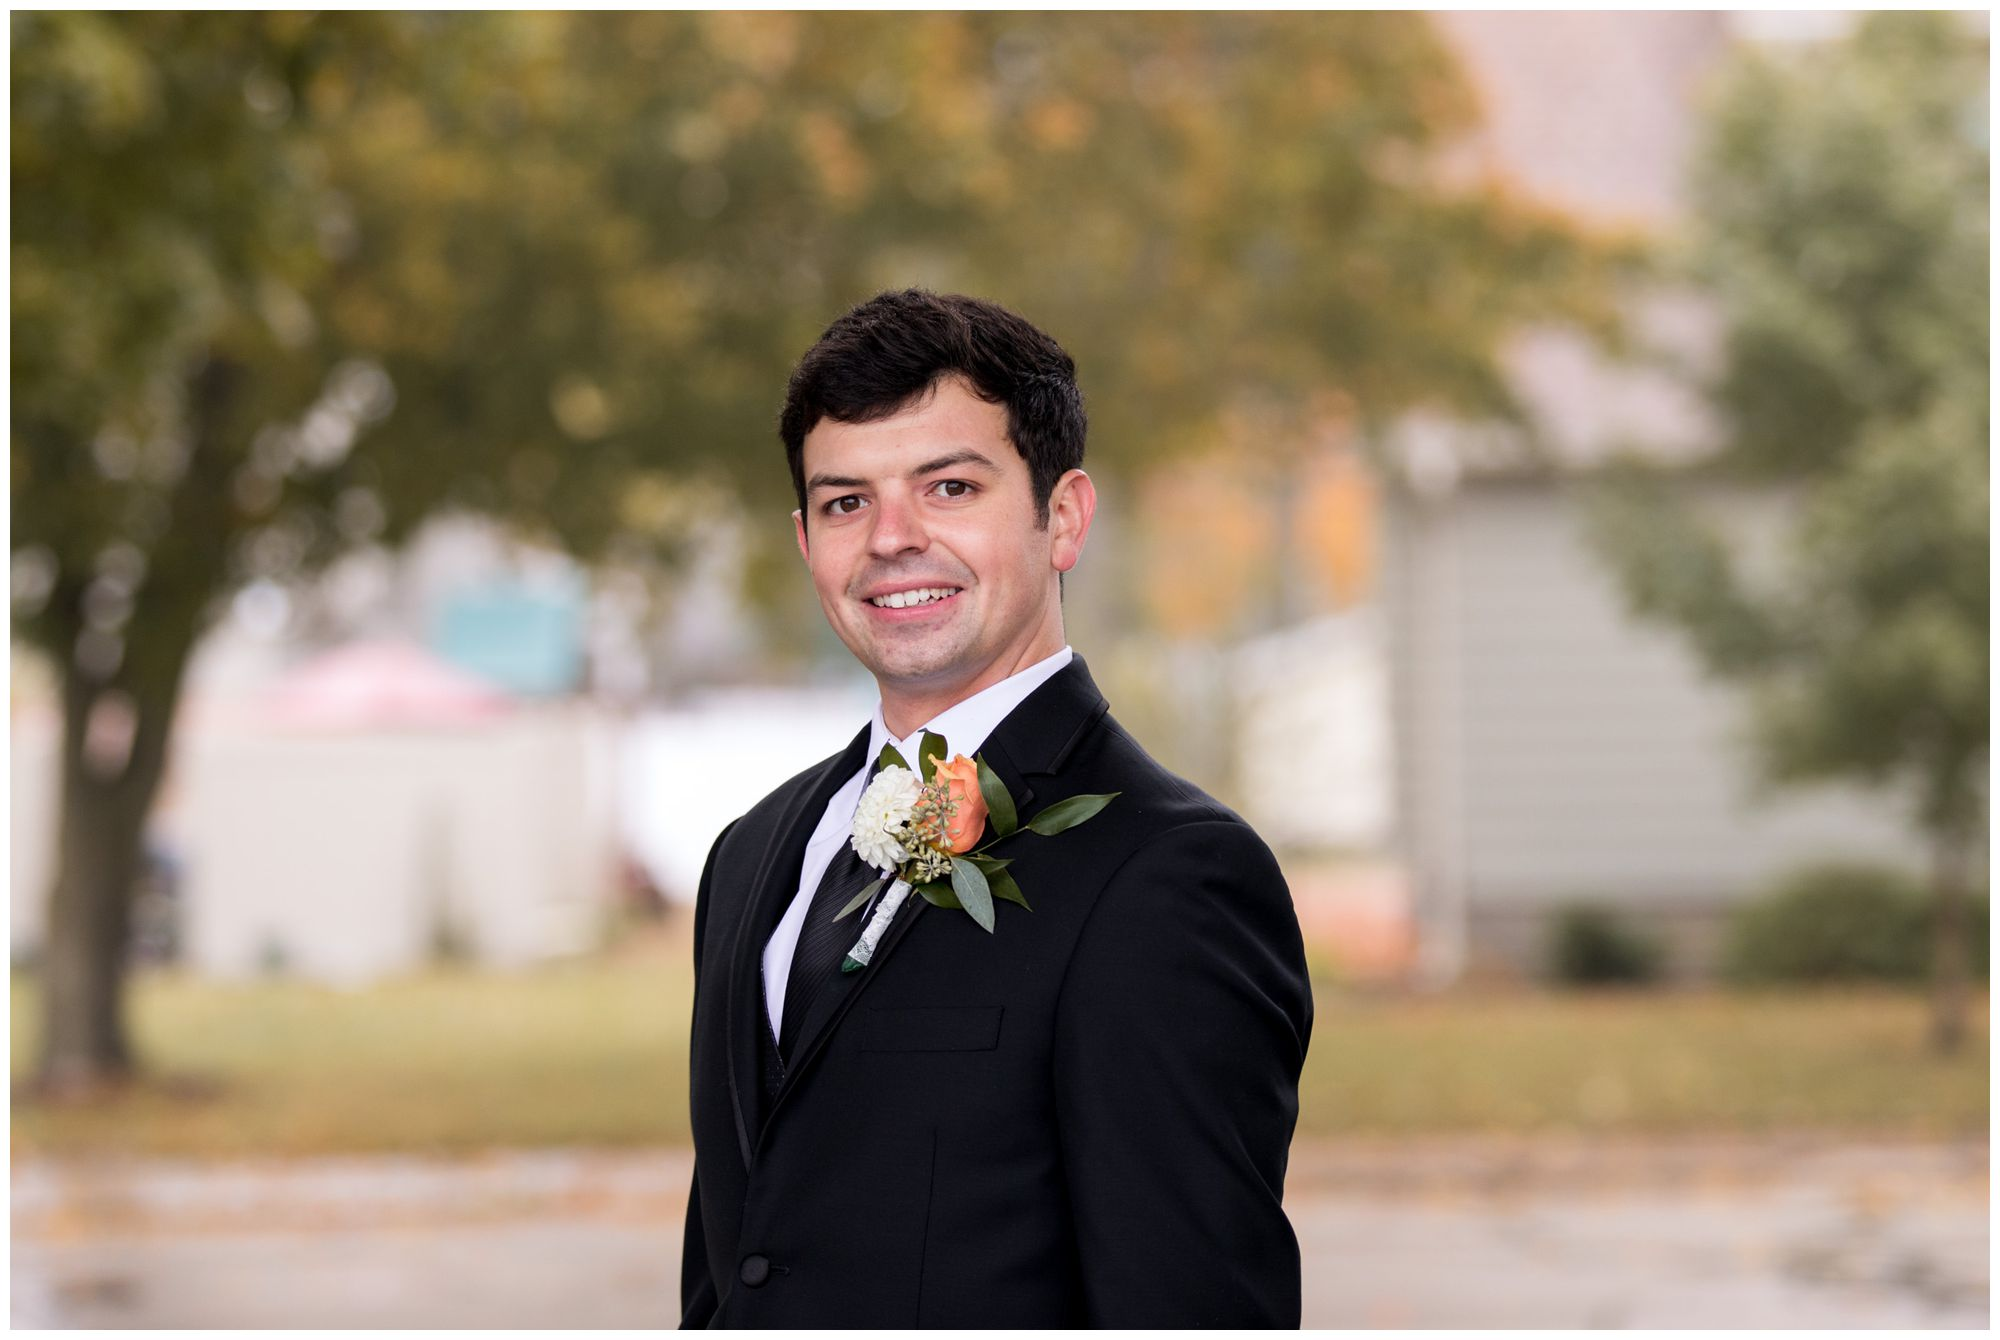 groom wedding portraits in Decatur Indiana